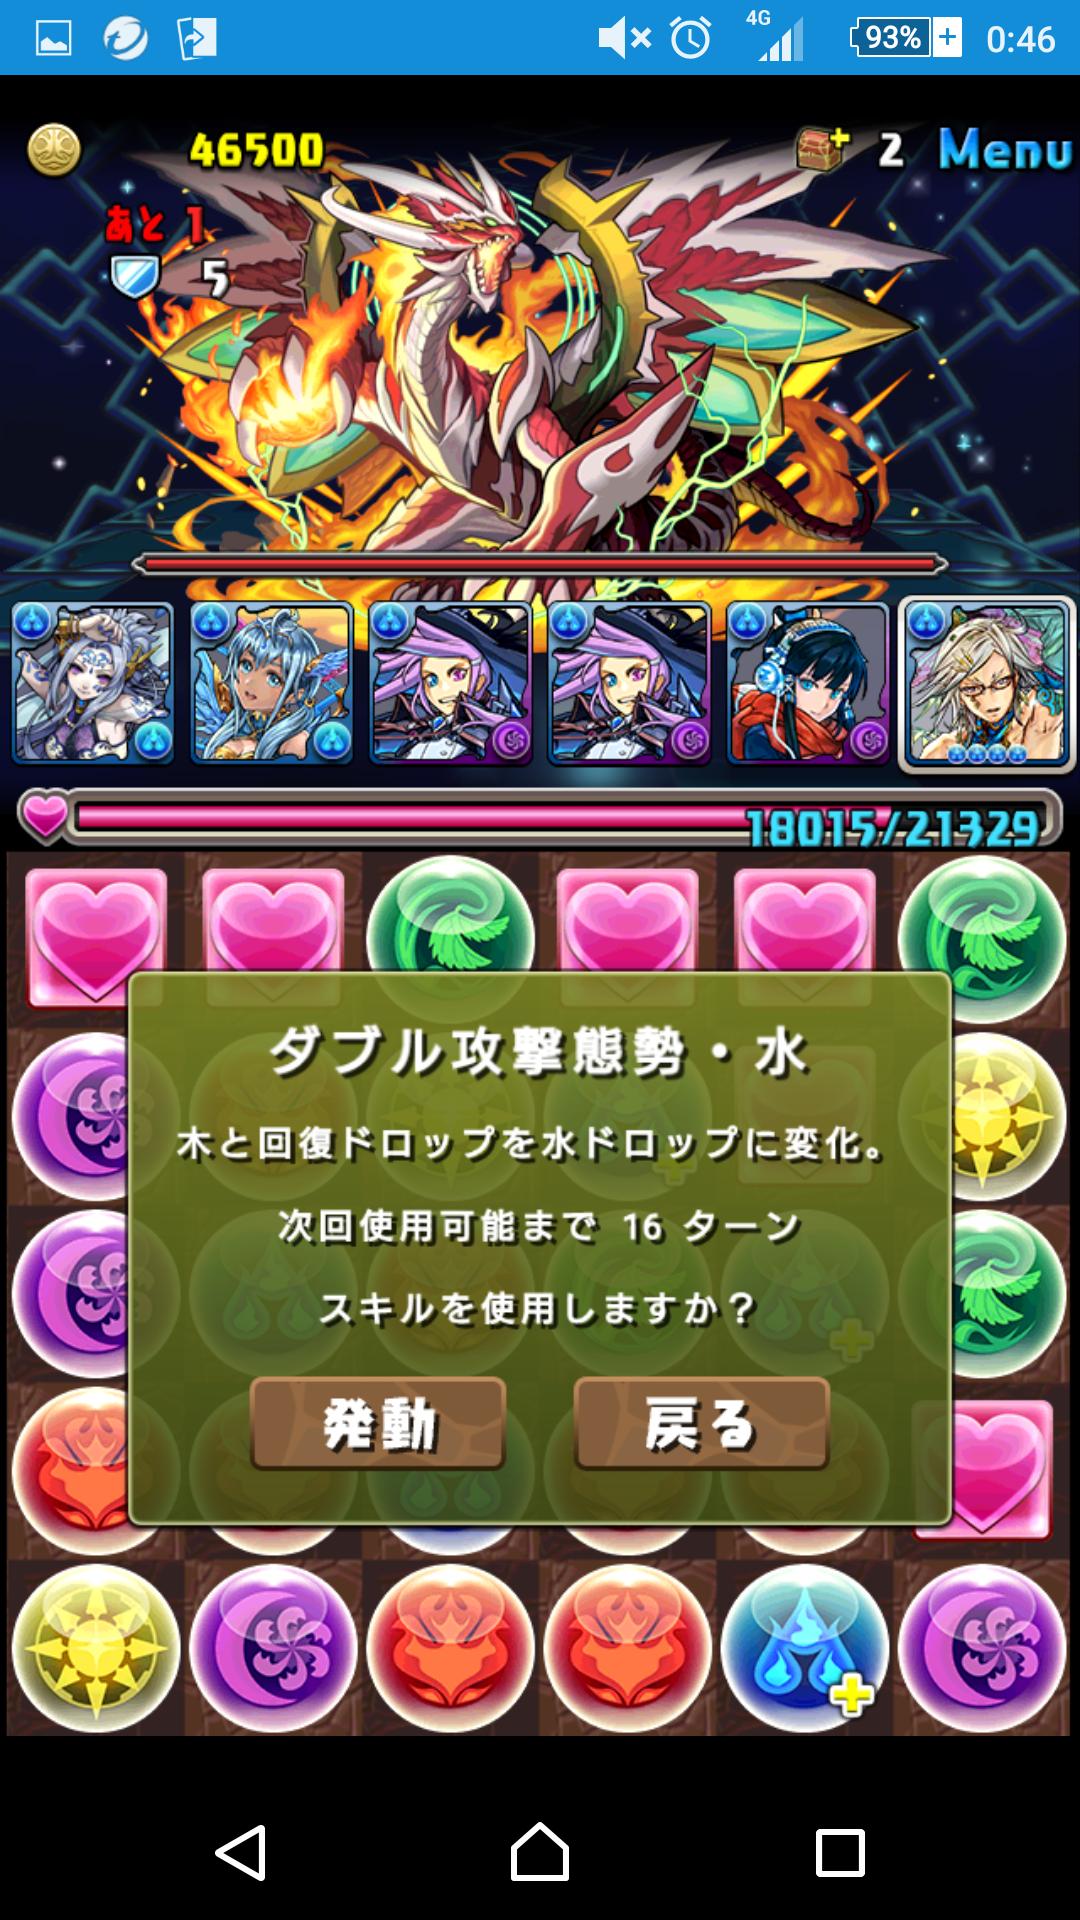 Screenshot_2016-05-16-00-46-39.png